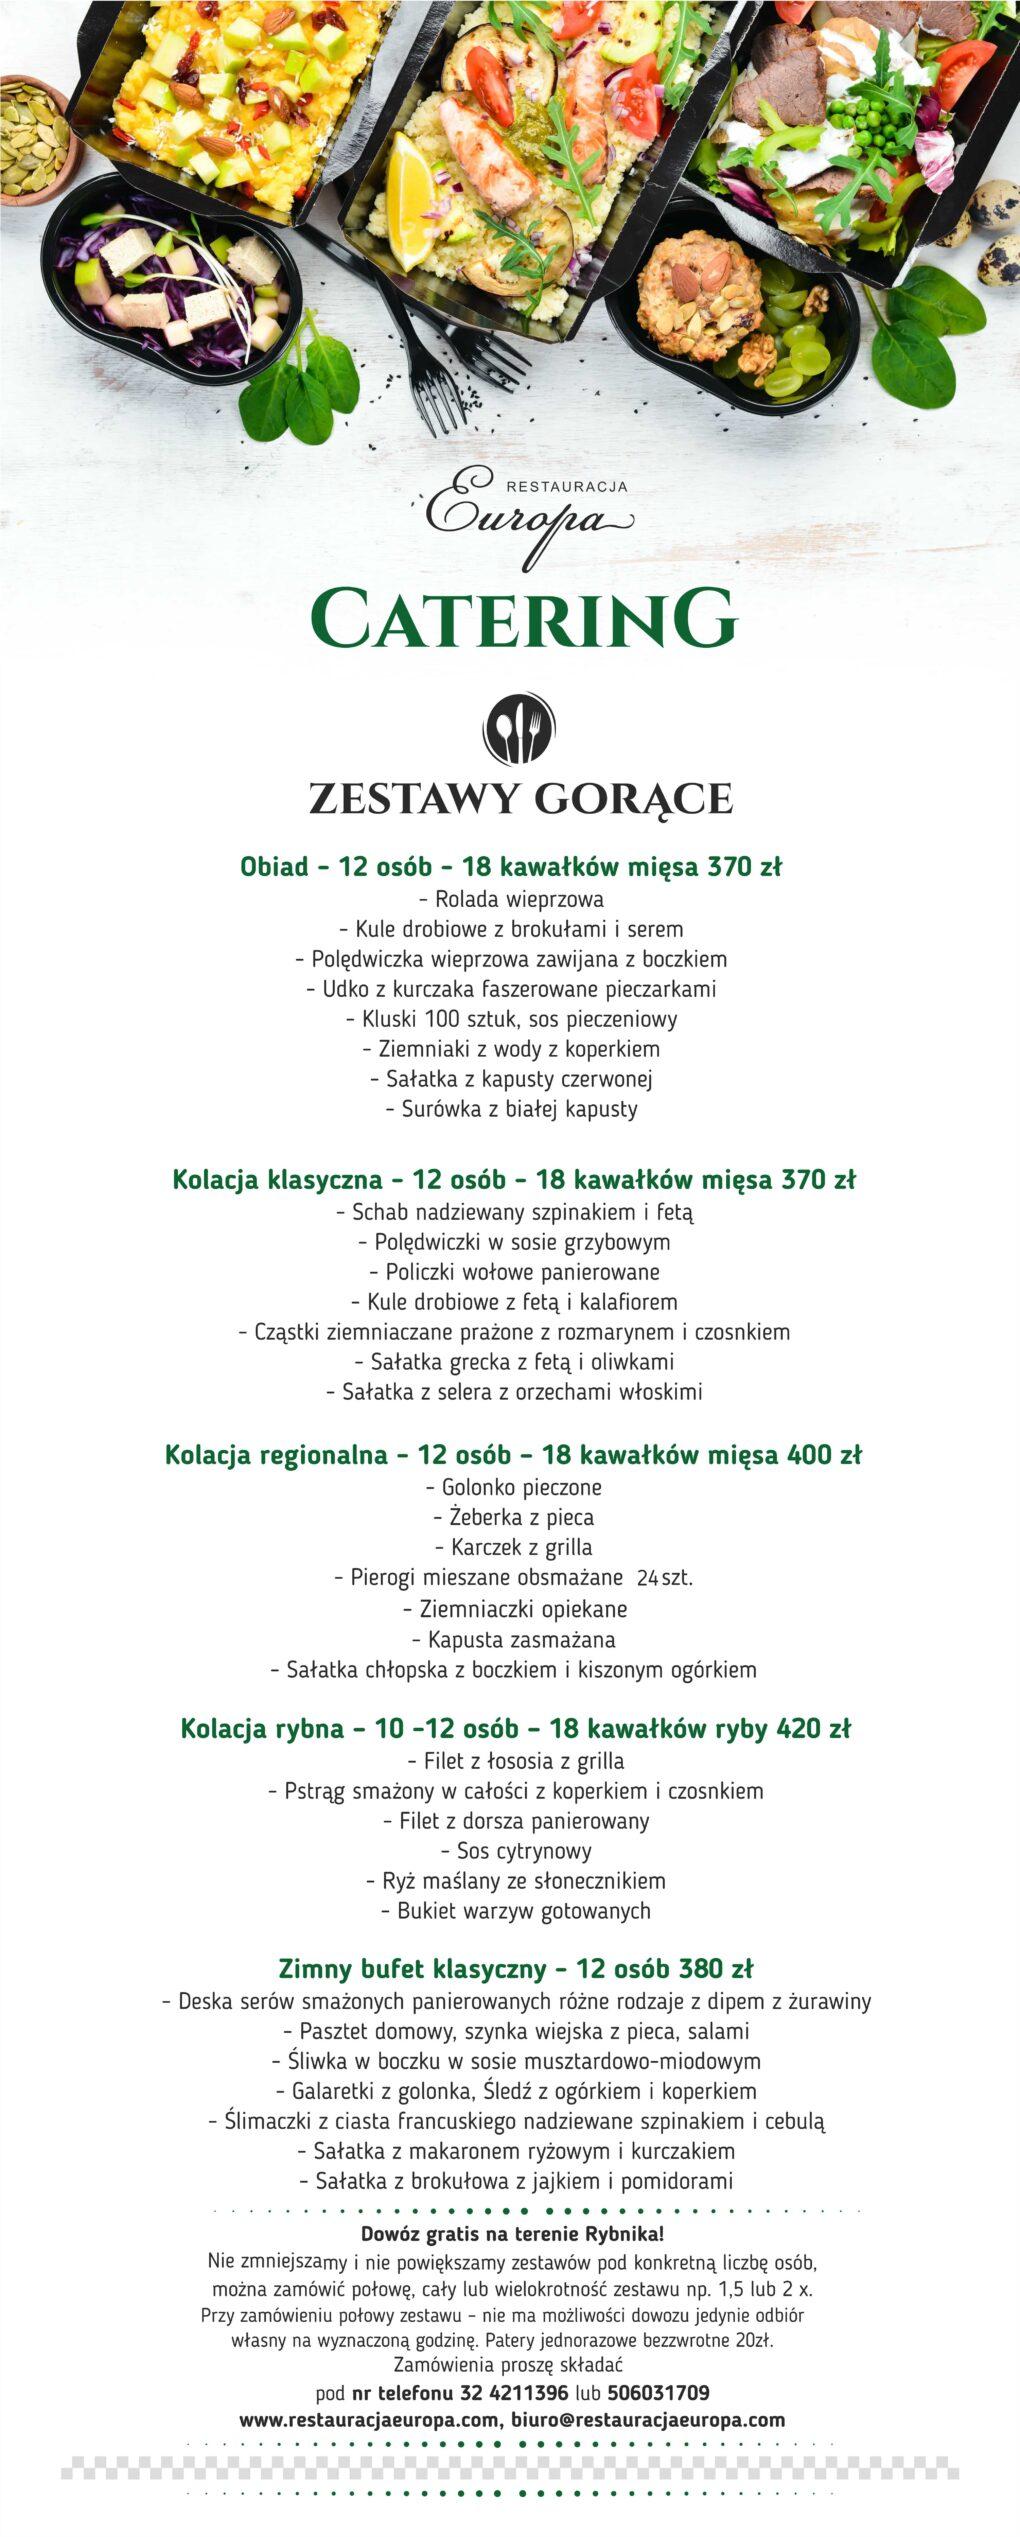 Catering 2020   Restauracja Europa Rybnik